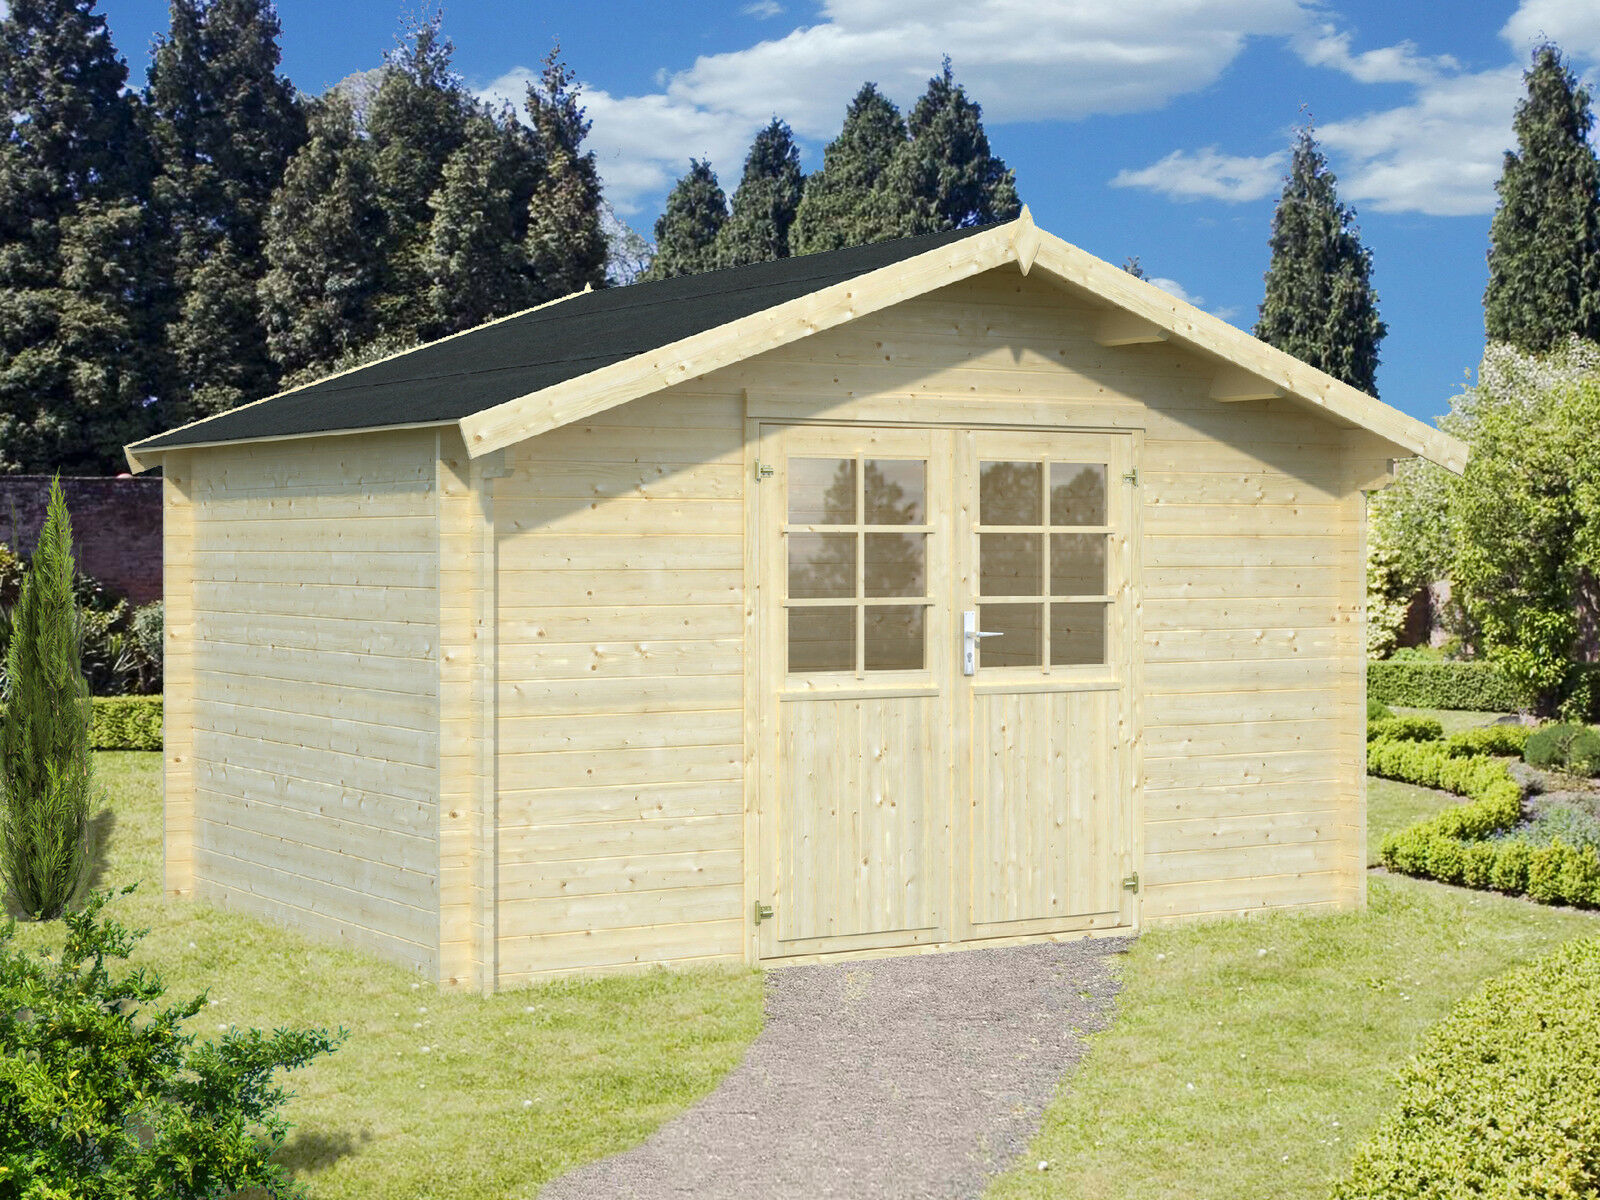 34 Mm Gartenhaus Greta Ca 4x3 M Ger Tehaus Blockhaus Holz